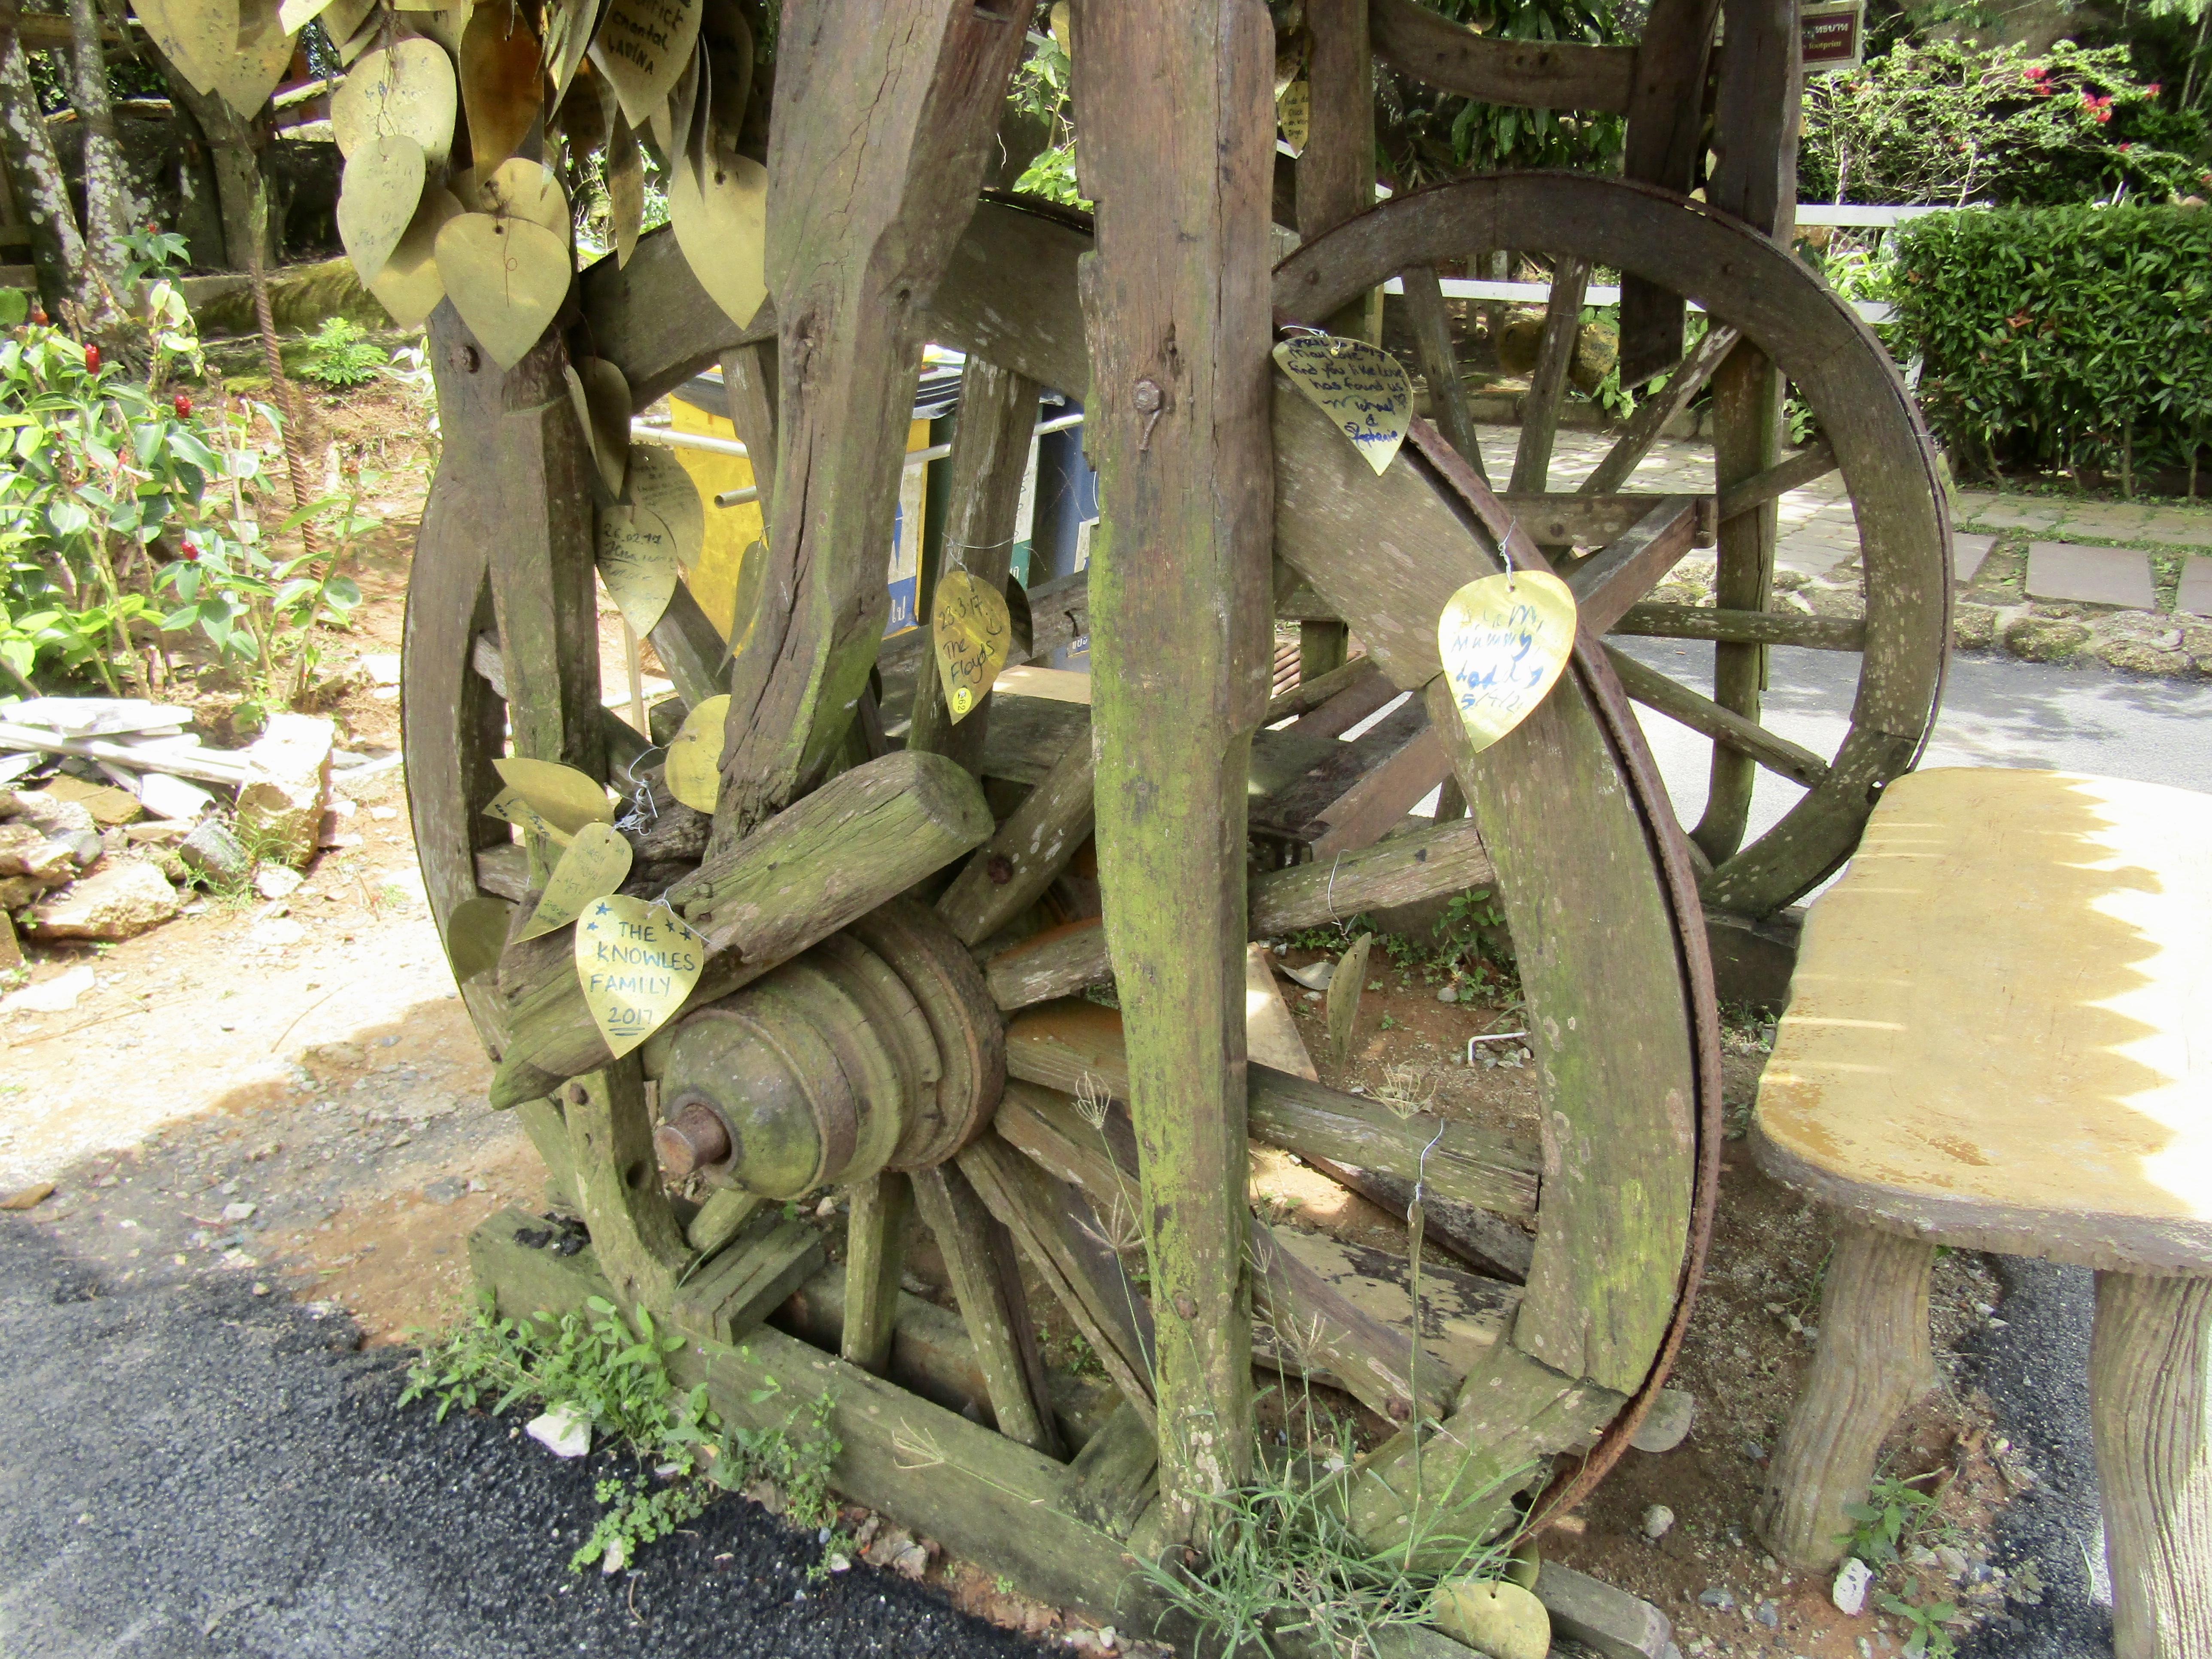 April 6th, 2017 - Phuket, Thailand - The Big Buddha - Gold Leaf on Wheel